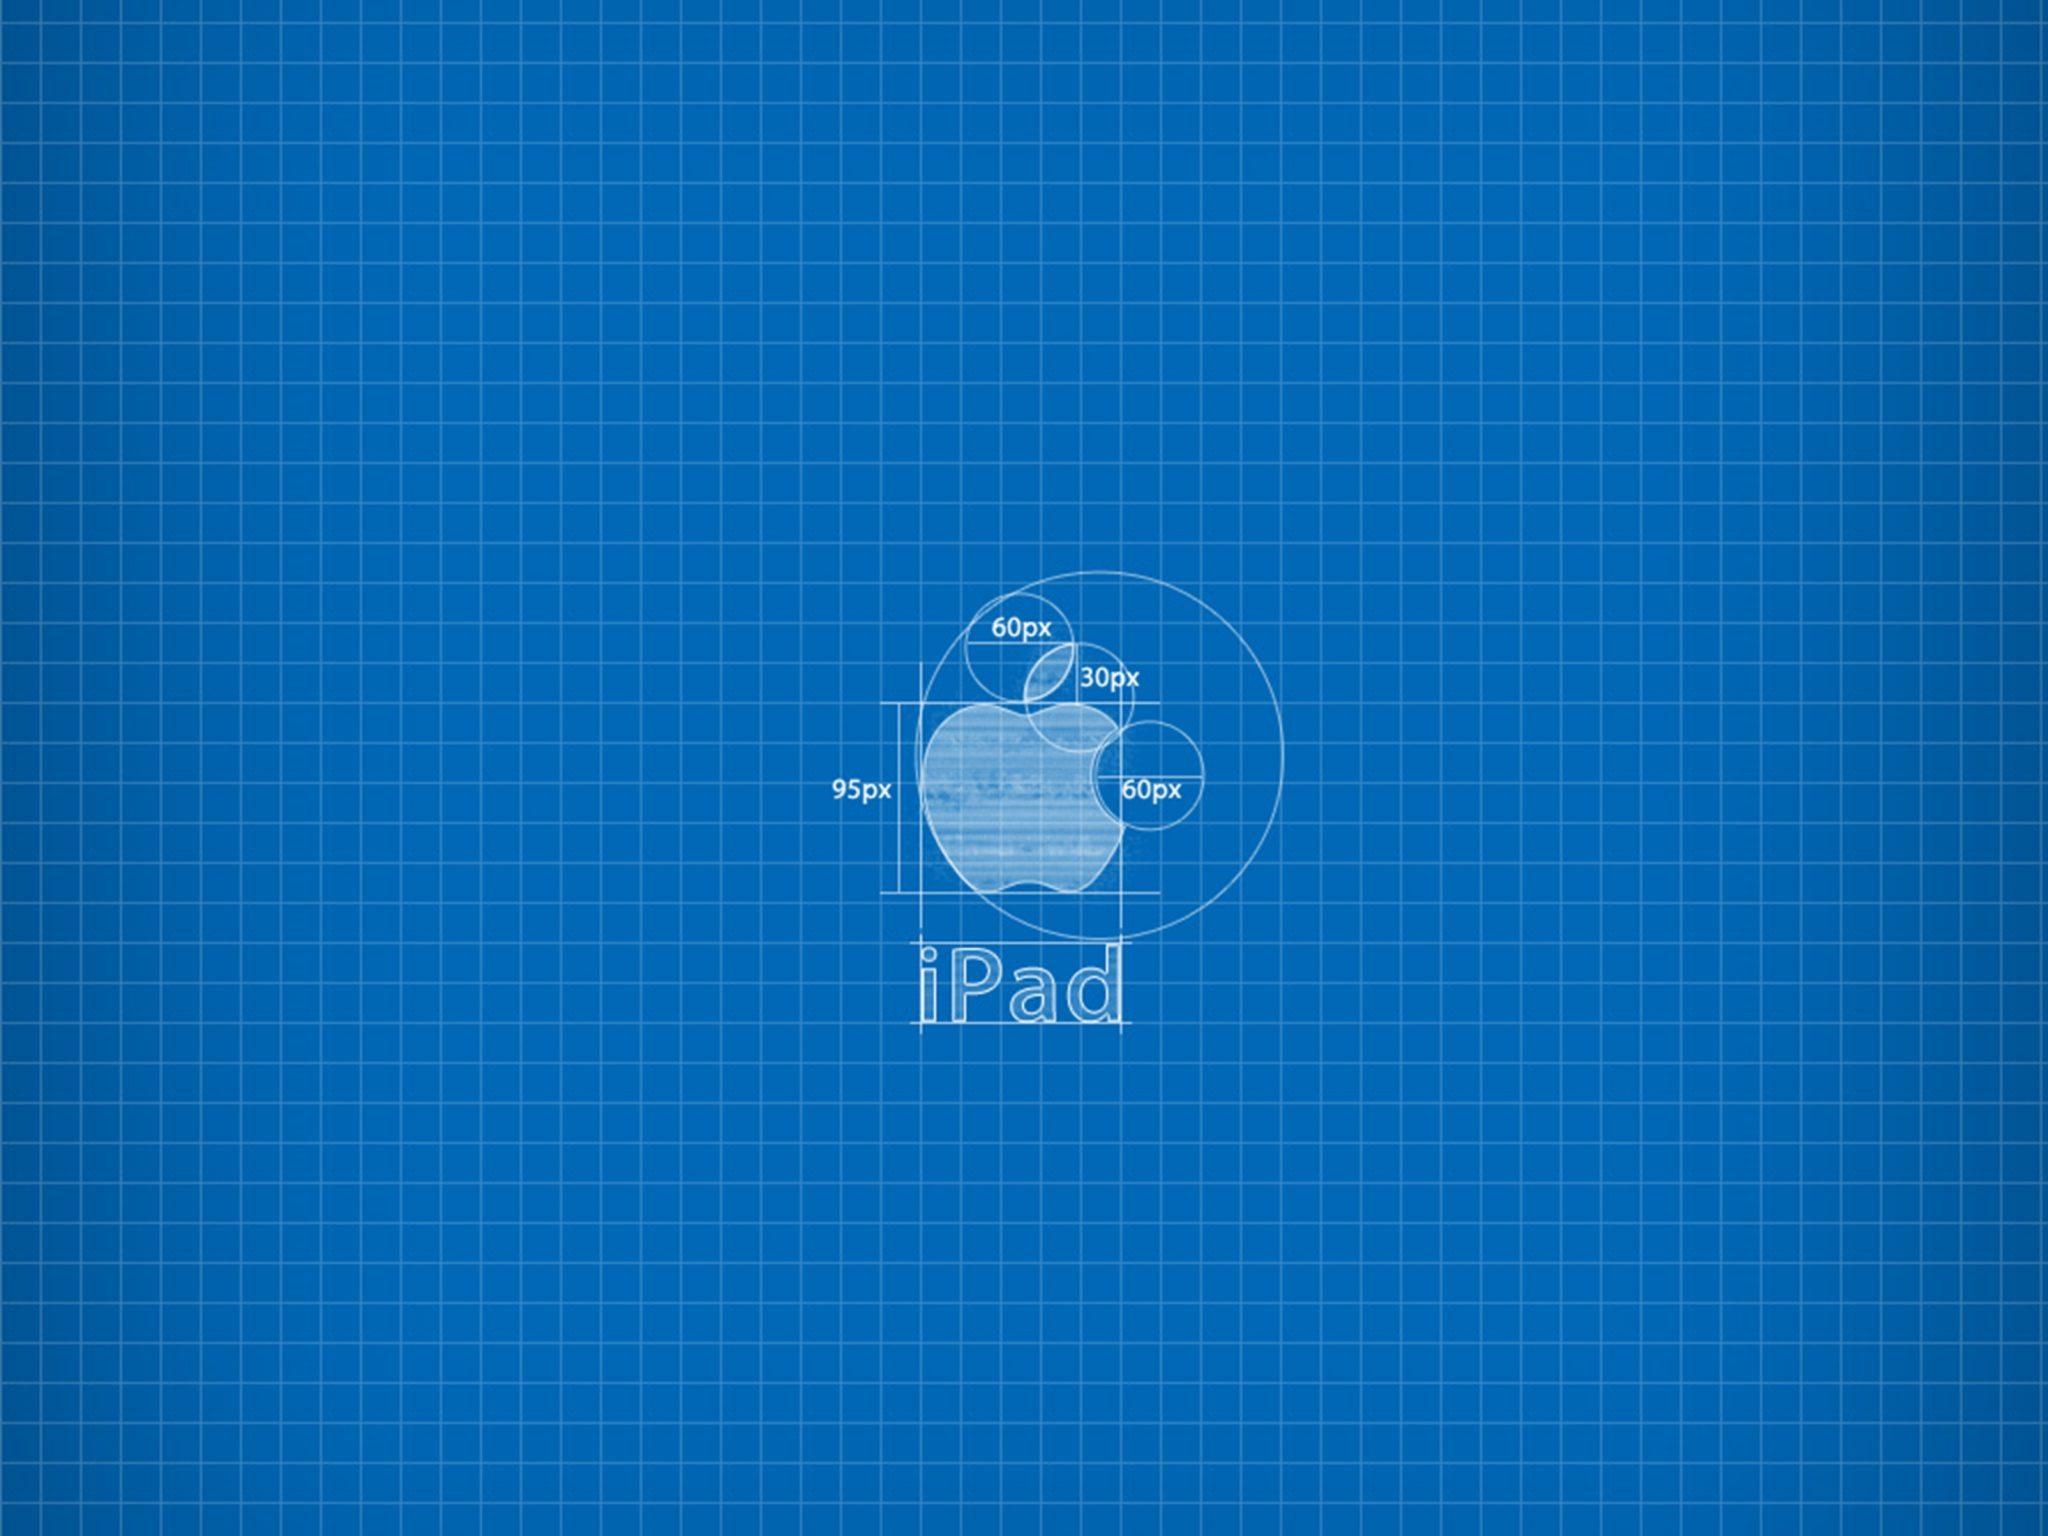 2048x1536 wallpaper Apple Blueprint Ipad Wallpaper 2048x1536 pixels resolution